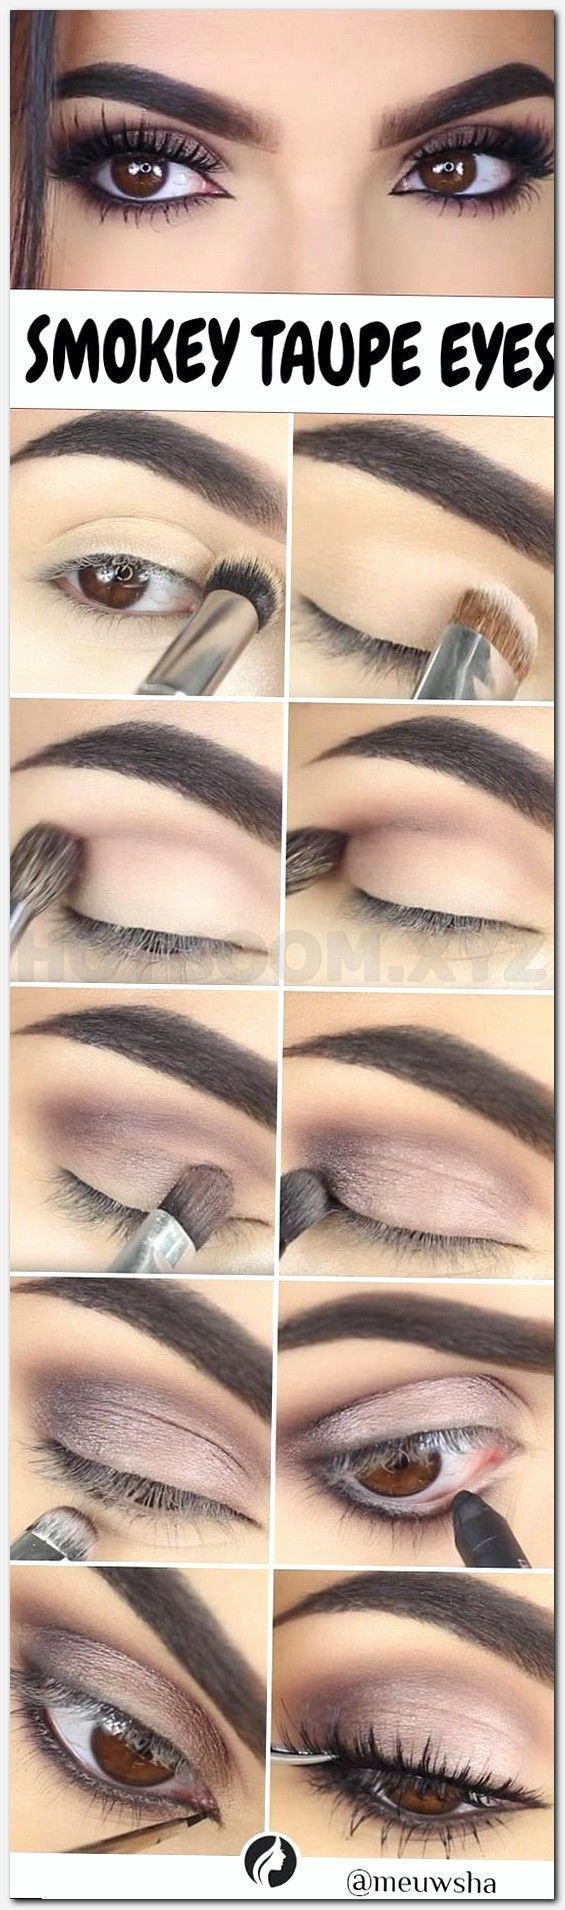 korean makeup ideas, how to do wedding makeup yourself